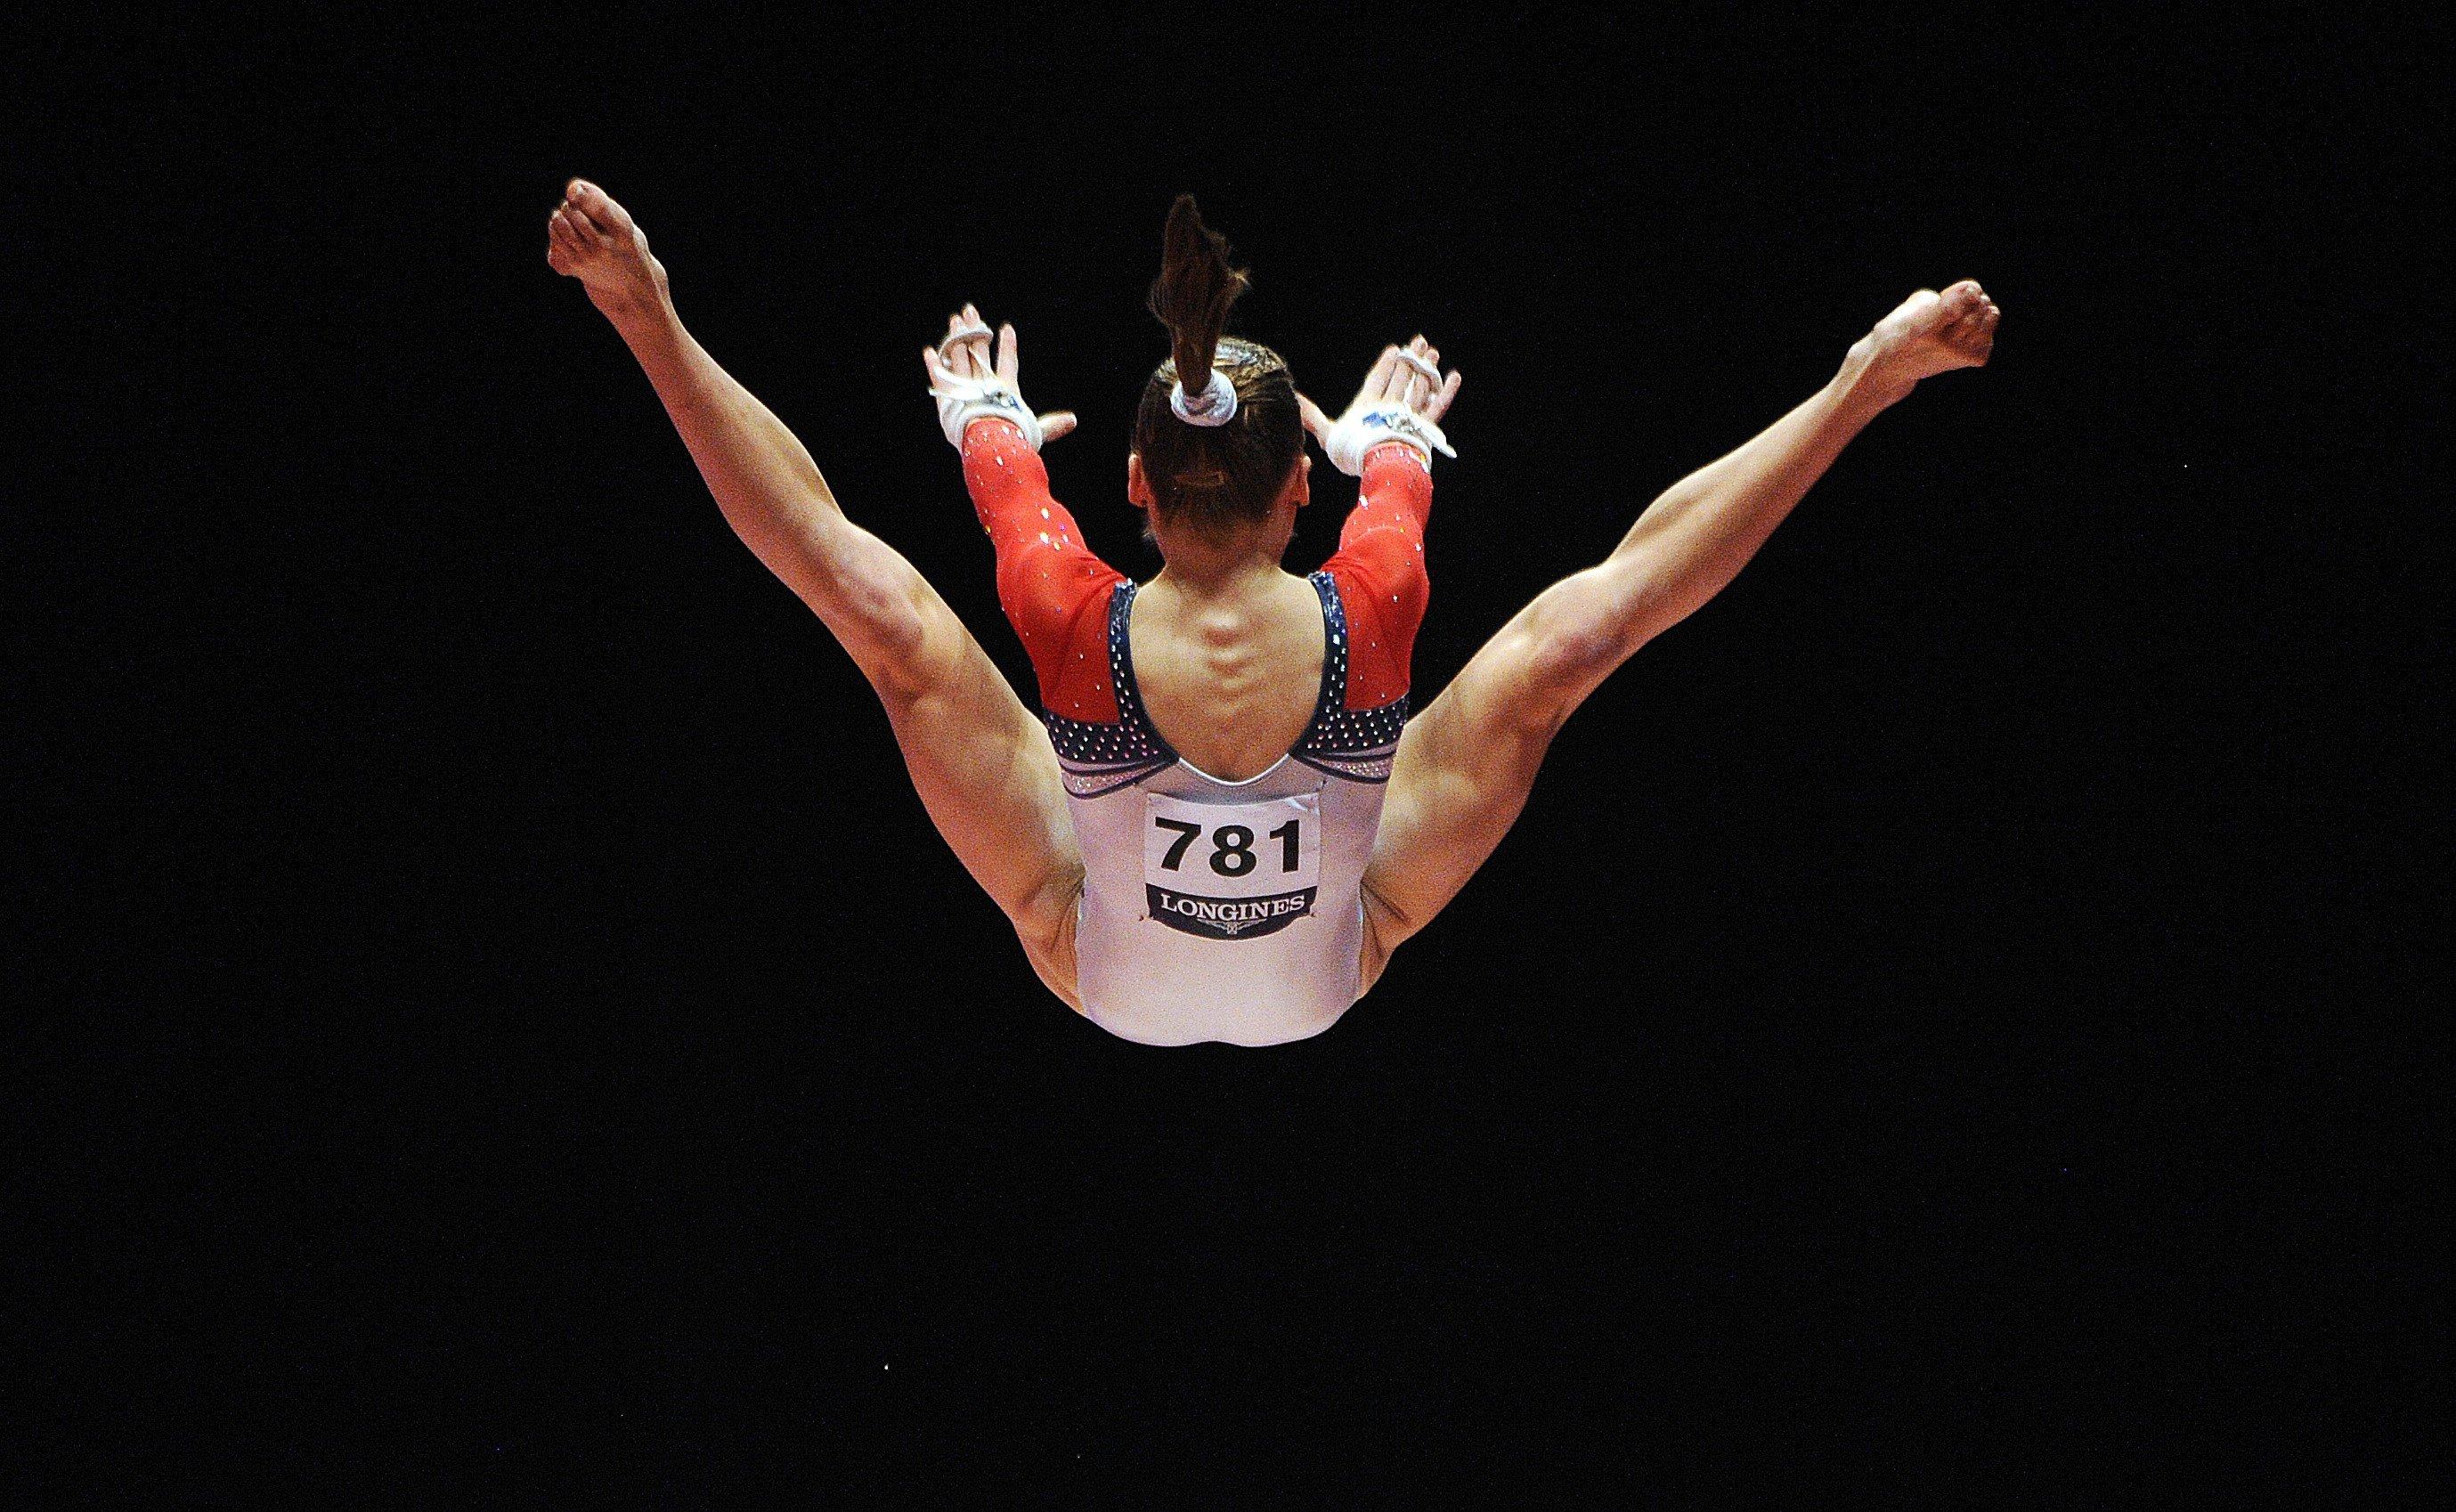 Think, that Gymnast crotch close view